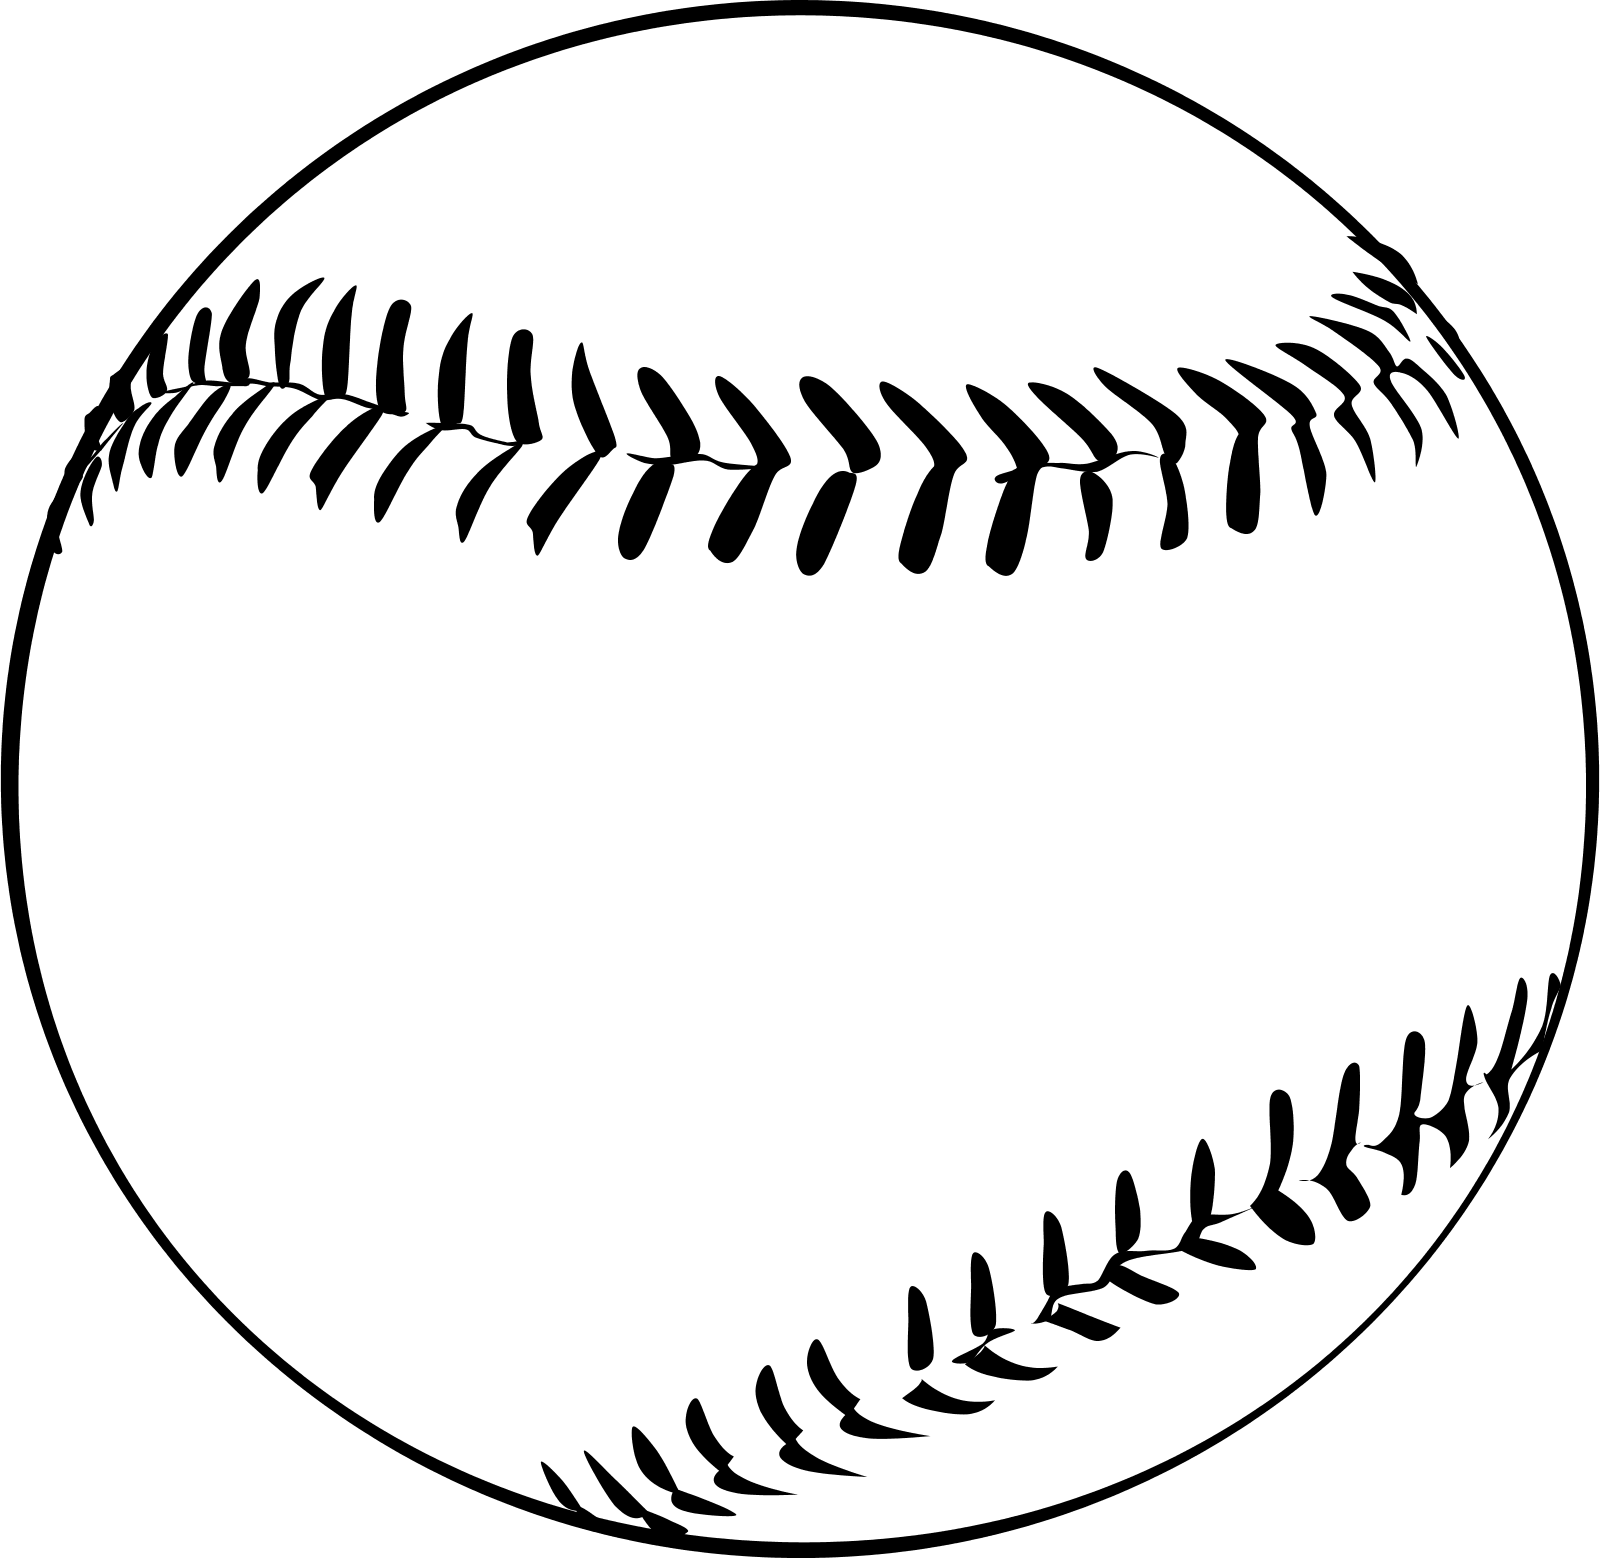 Baseball Glove Clip Art - Cliparts.co